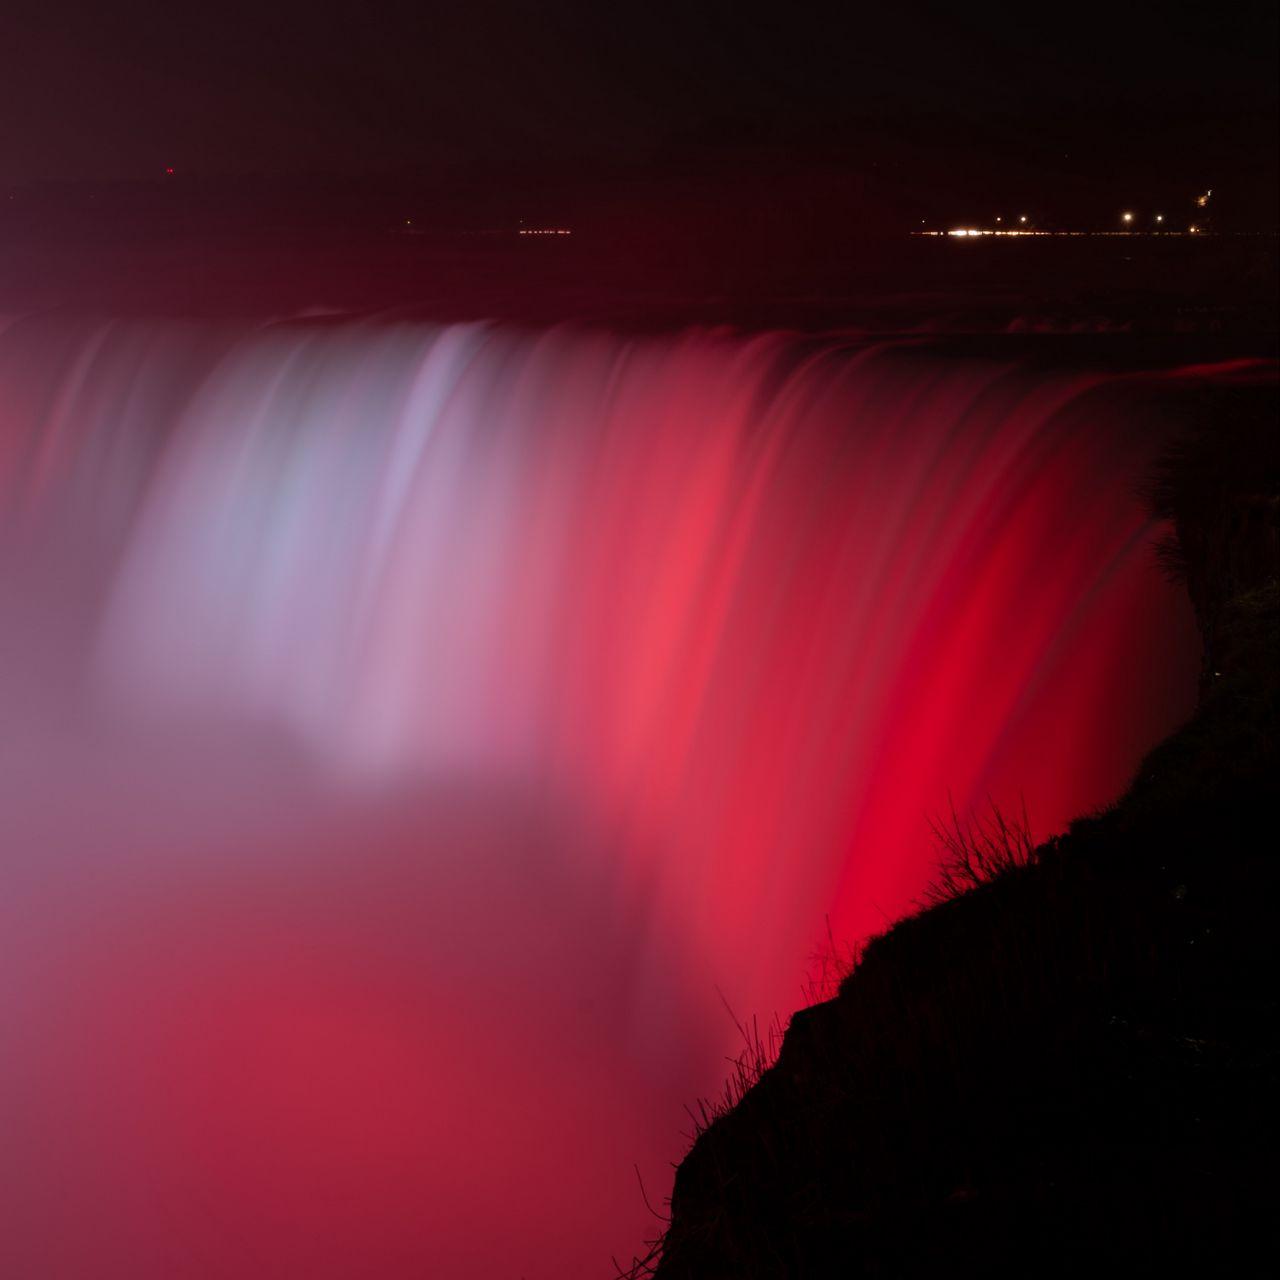 1280x1280 Wallpaper waterfall, fog, backlight, red, dark